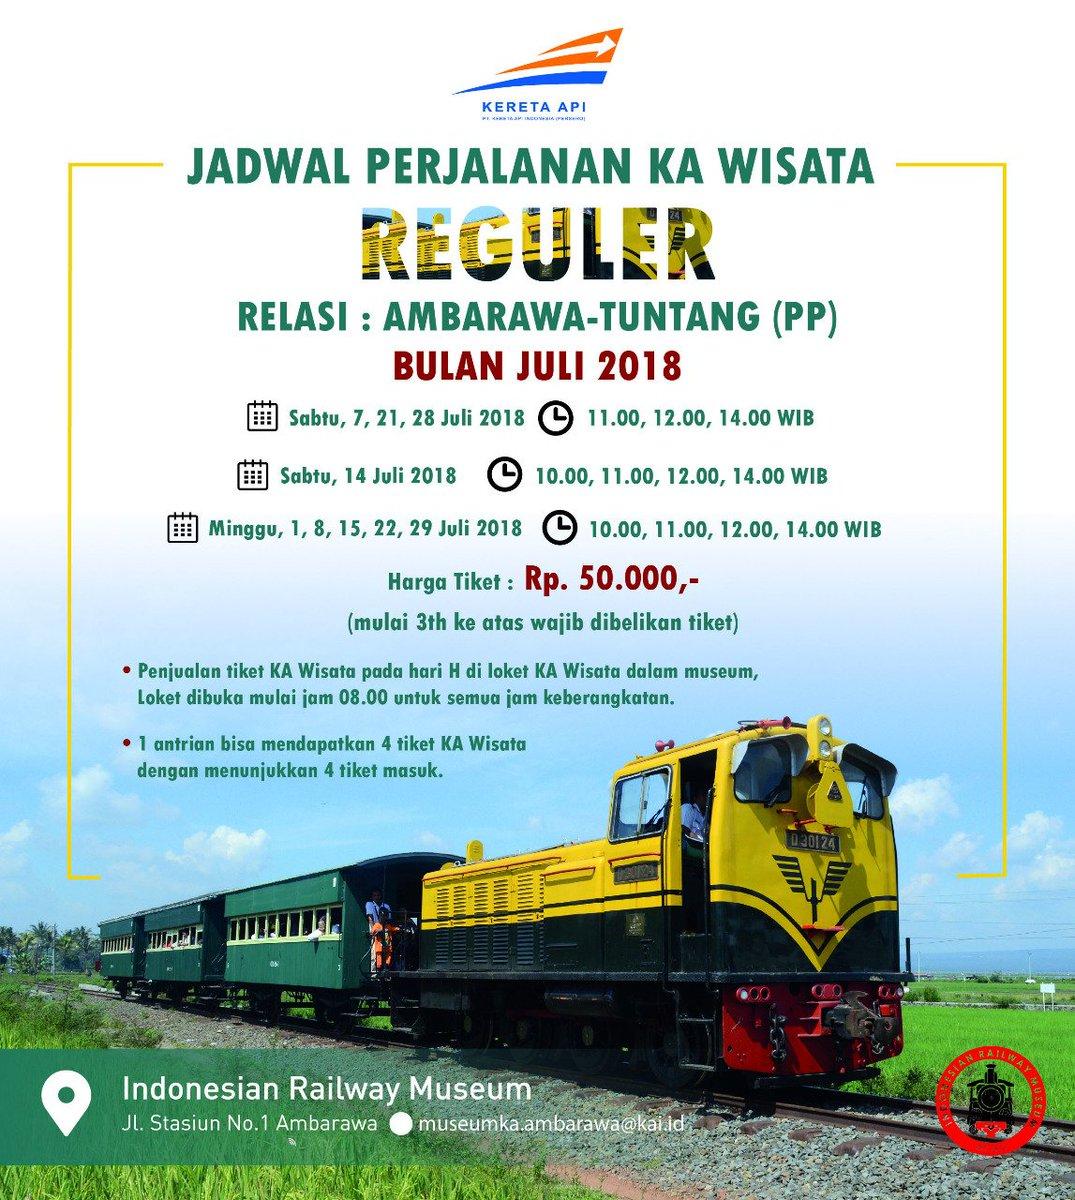 Kereta Api Indonesia On Twitter Pengen Ngisi Liburanmu